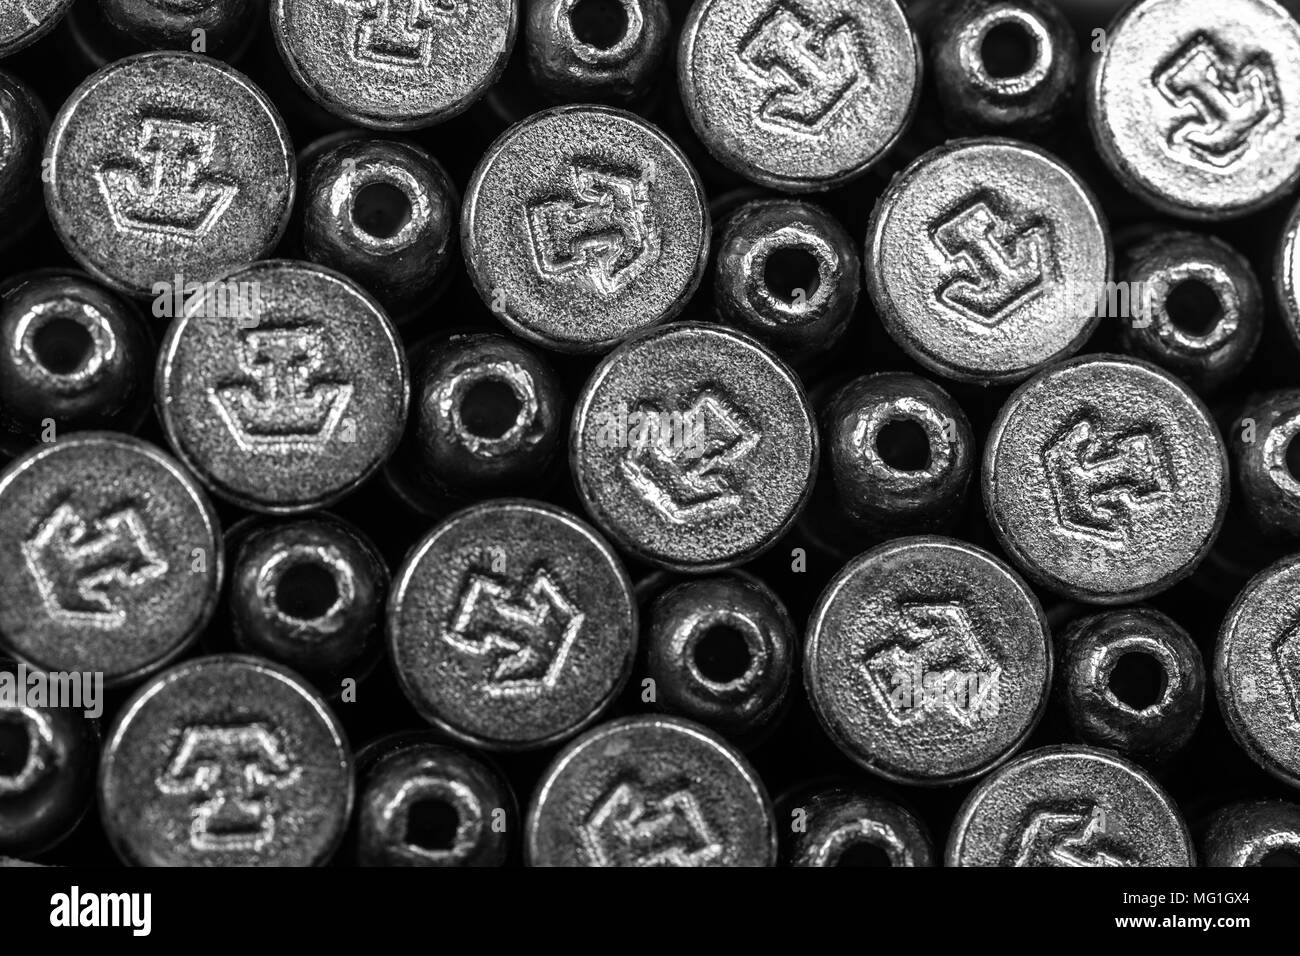 22lr ammunition stock photo 181973404 alamy